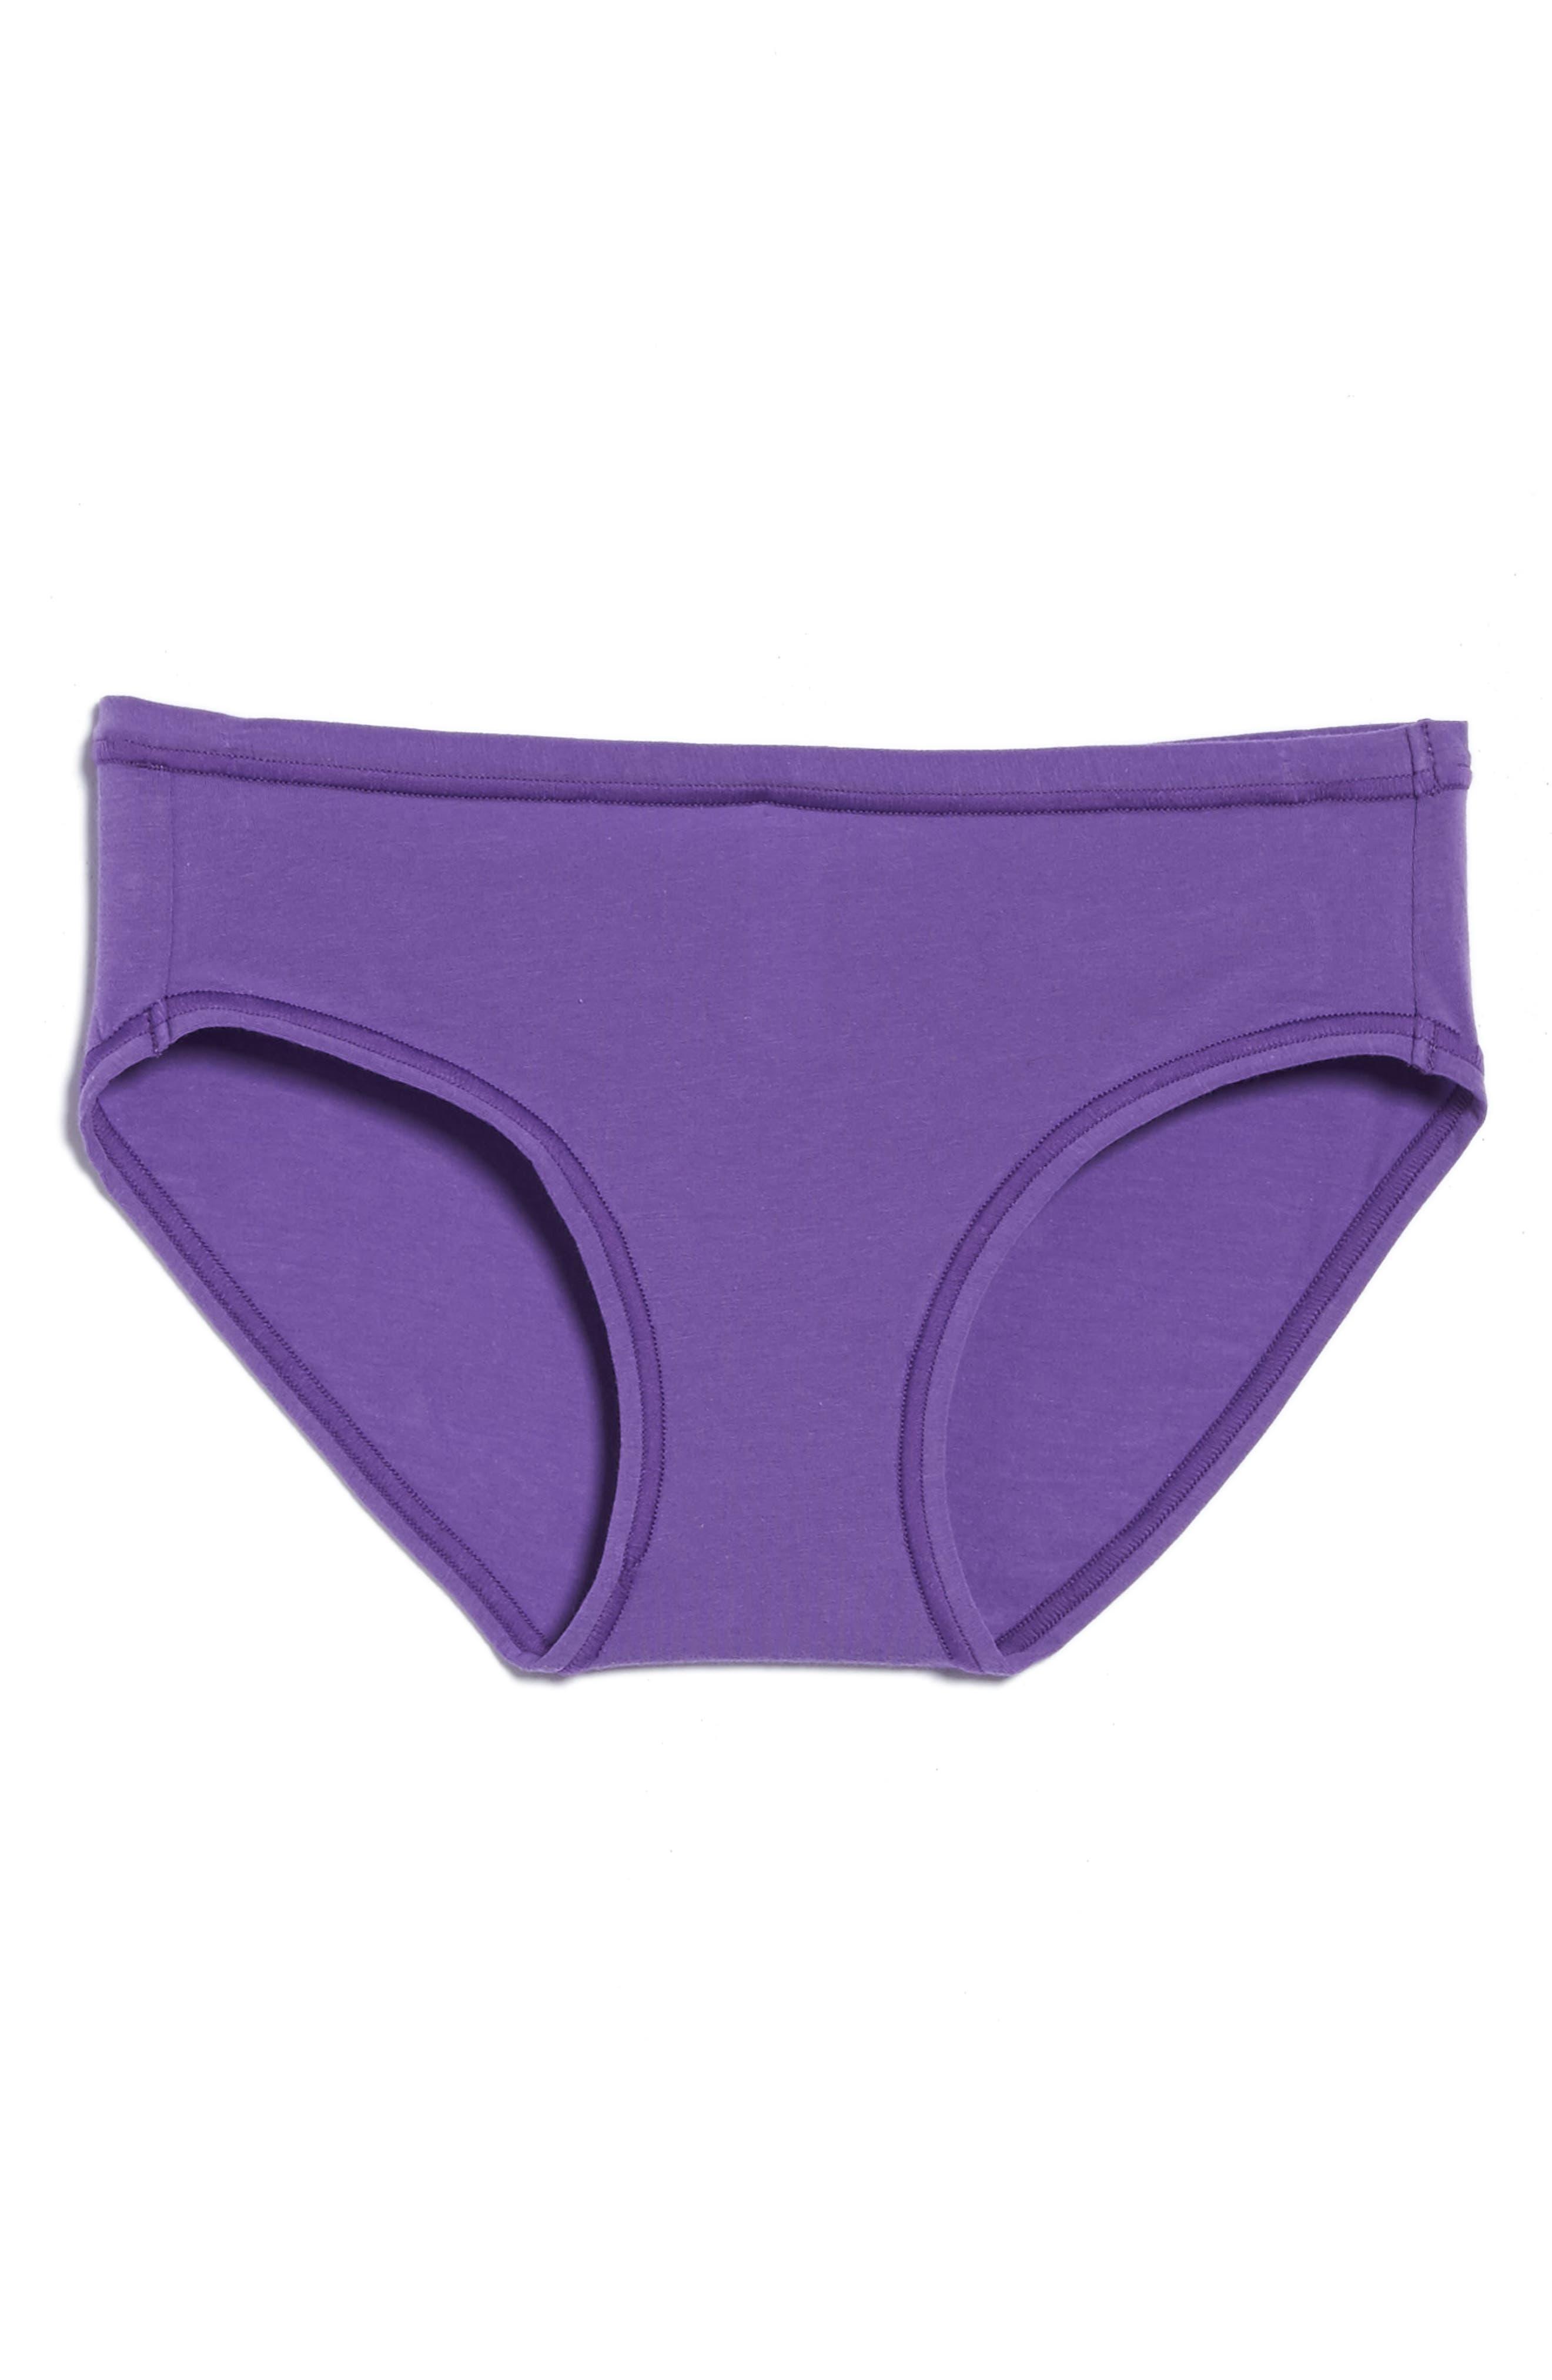 Alternate Image 4  - Wacoal B Fitting Bikini (3 for $28)